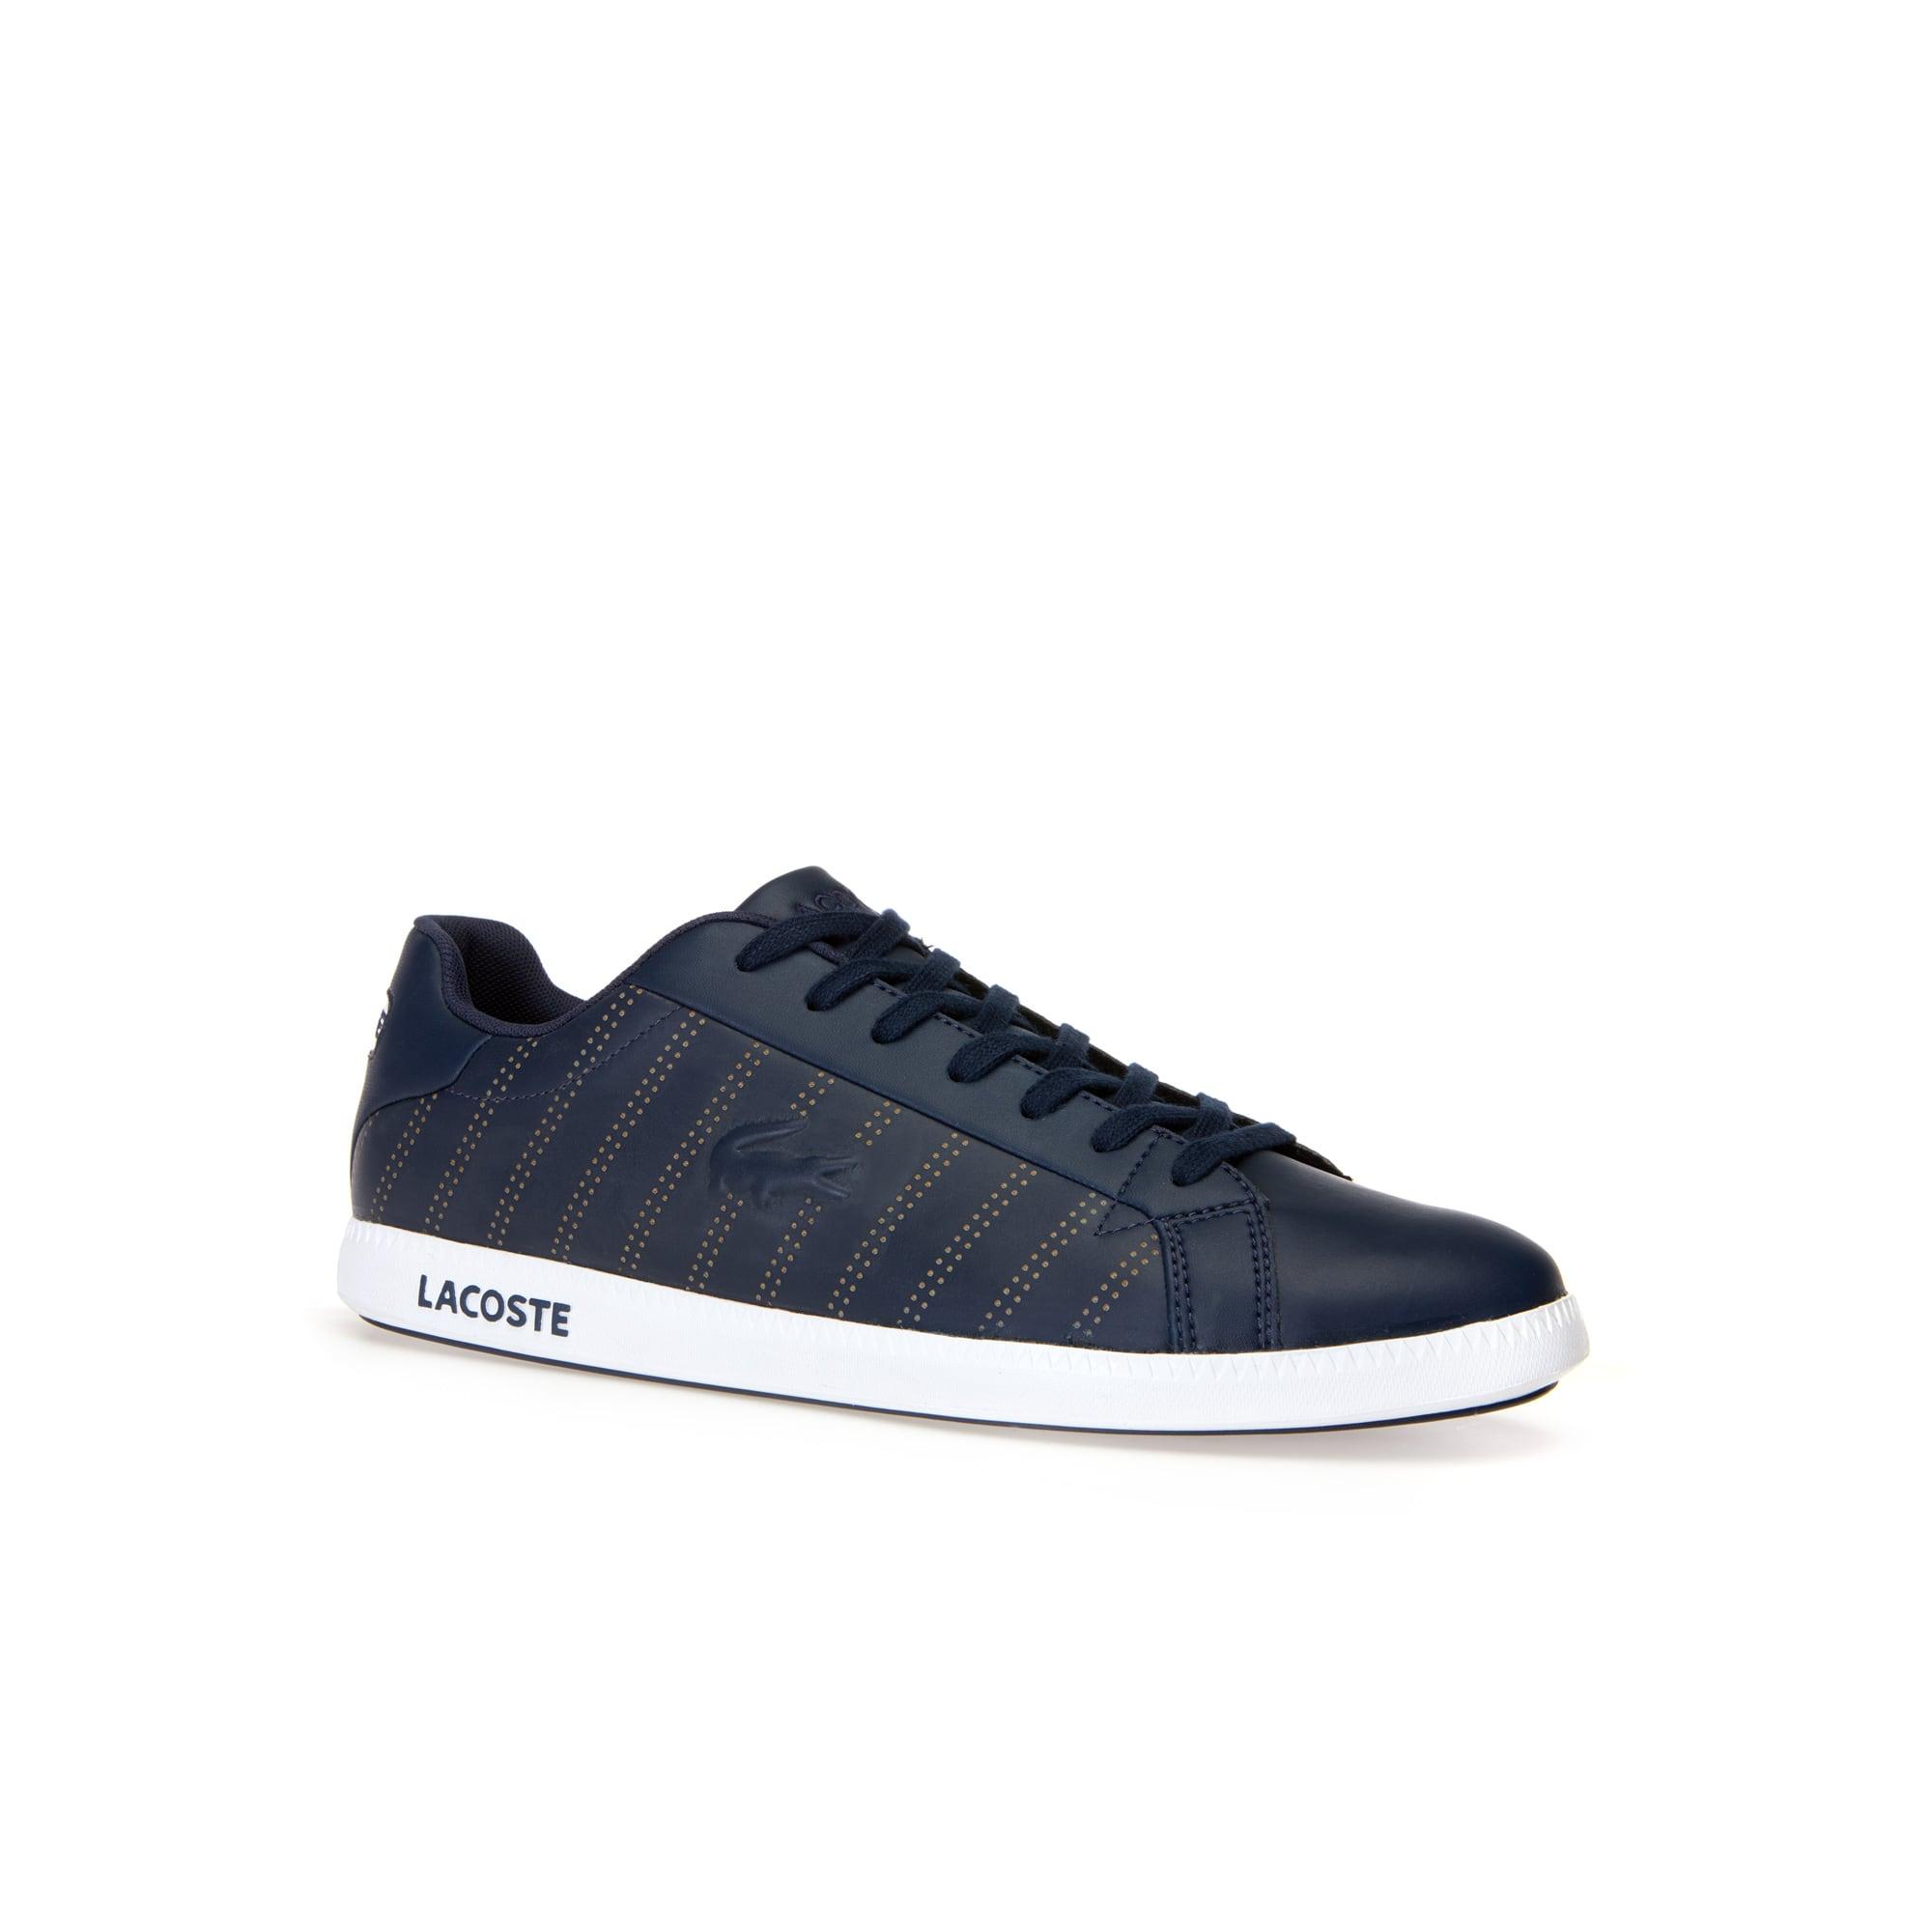 Herren-Sneakers GRADUATE aus Nappaleder